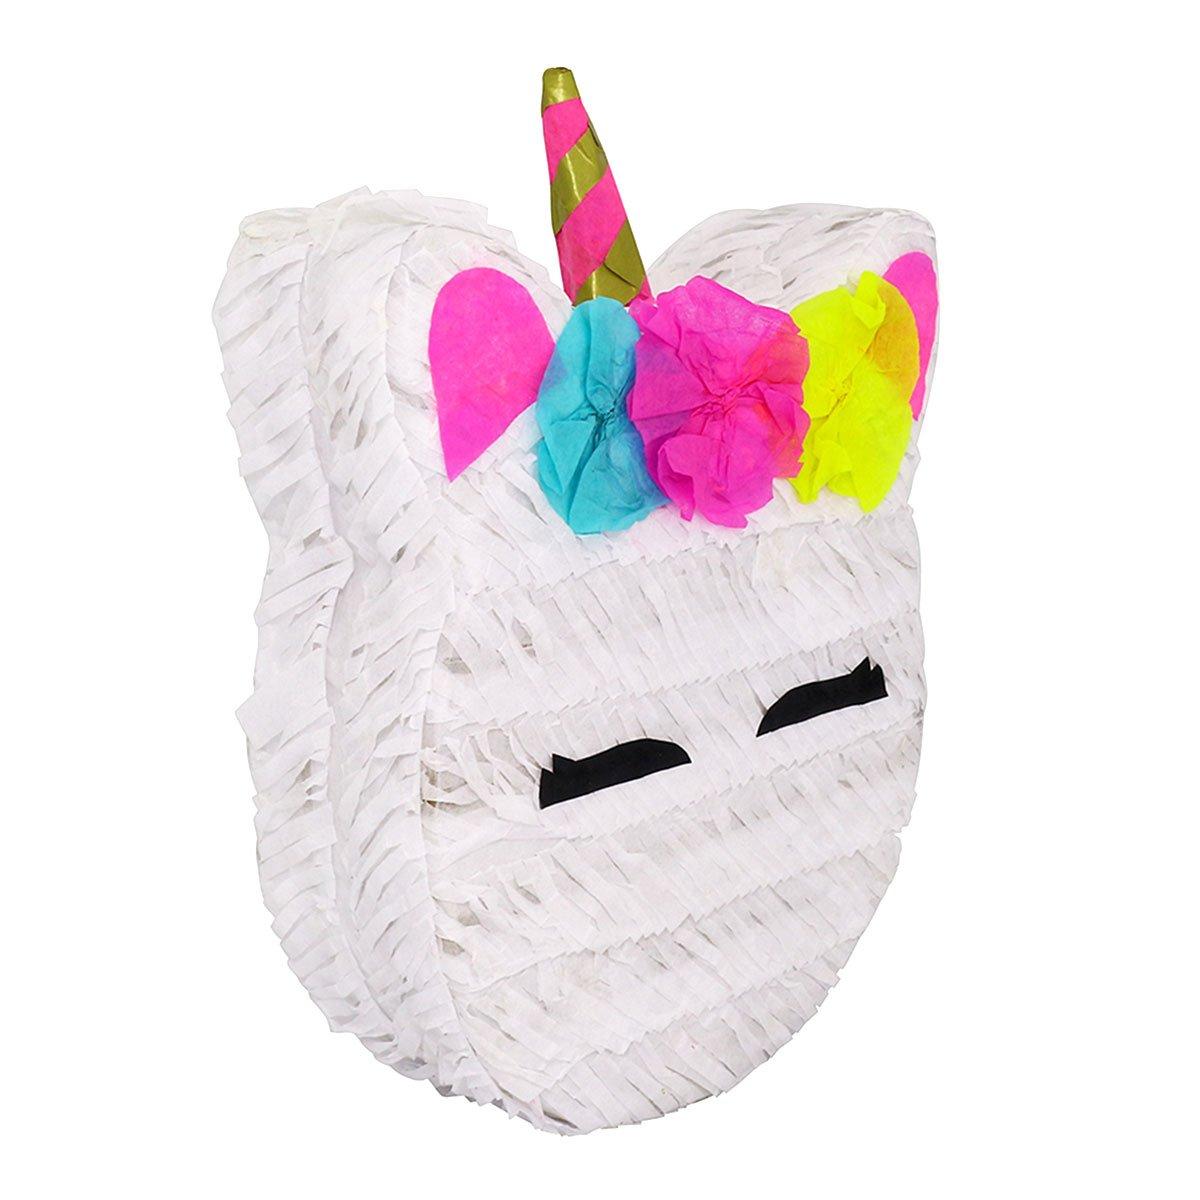 Amazon.com: LYTIO 3 Mini Unicorn Pinata (Piñata) Ideal for Parties, Center Piece or Photo Prop (3 Mini Unicorn): Kitchen & Dining